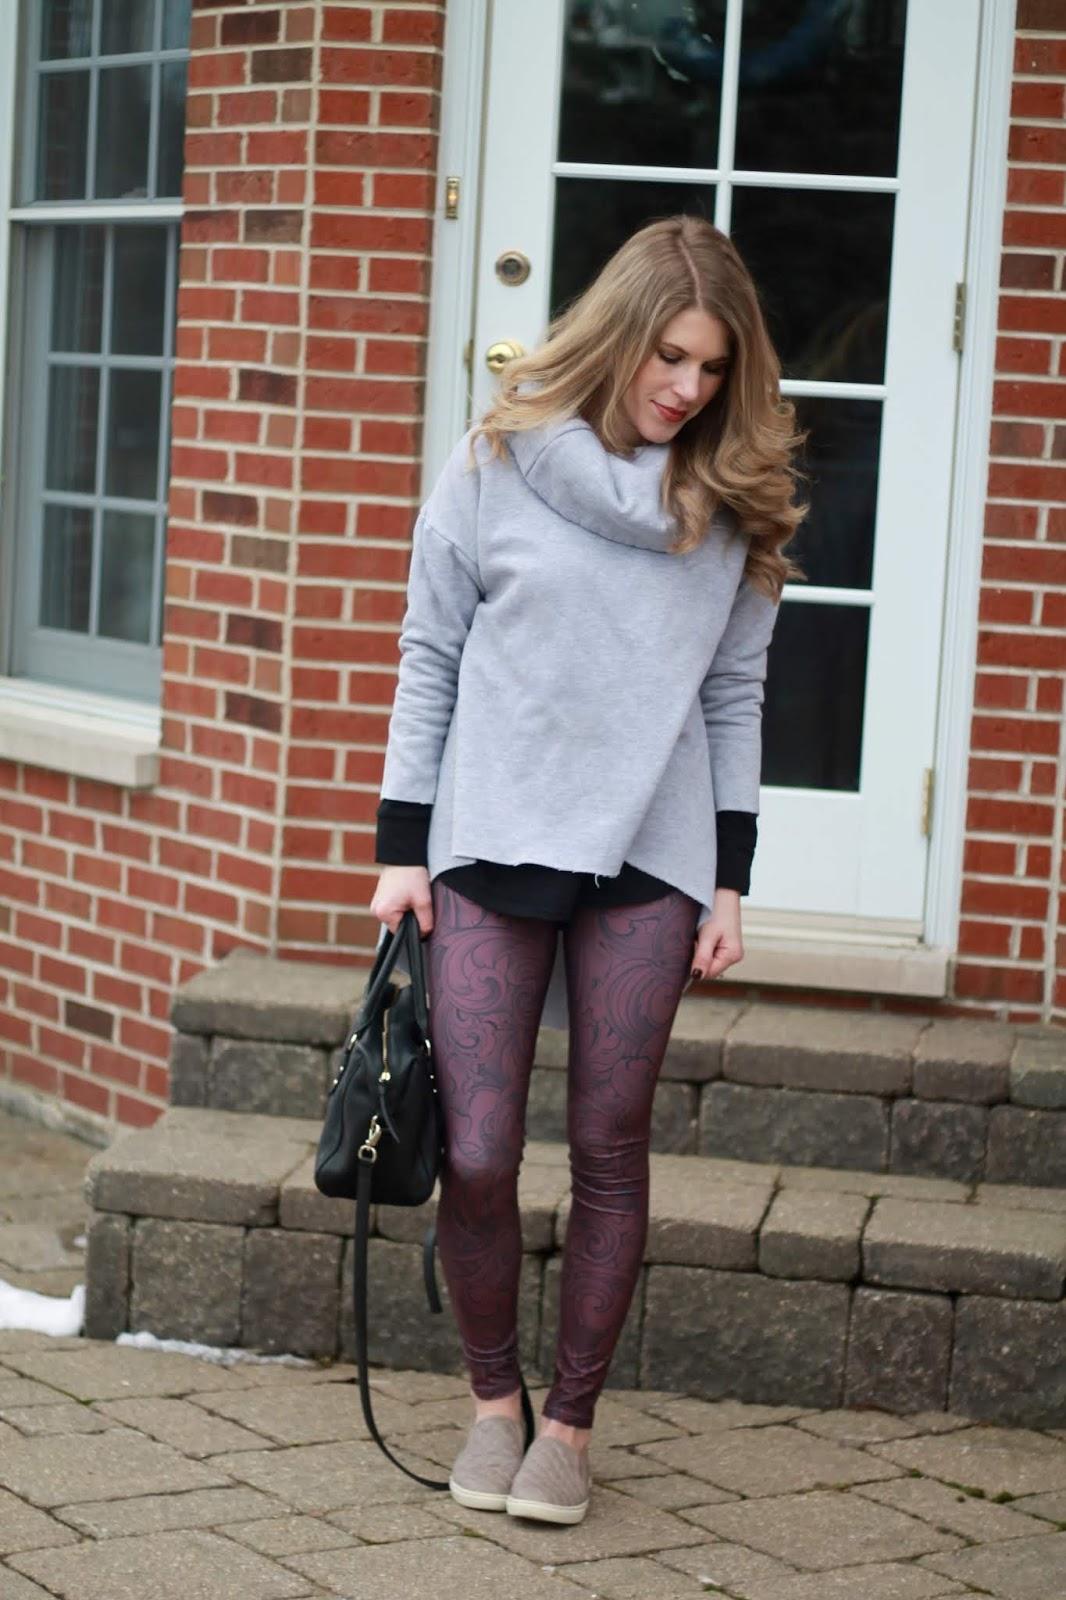 burgundy printed leggings, tunic sweatshirt, taupe slip ons, grey cable knit tunic, black booties, kate spade black crossbody bag, black floppy hat